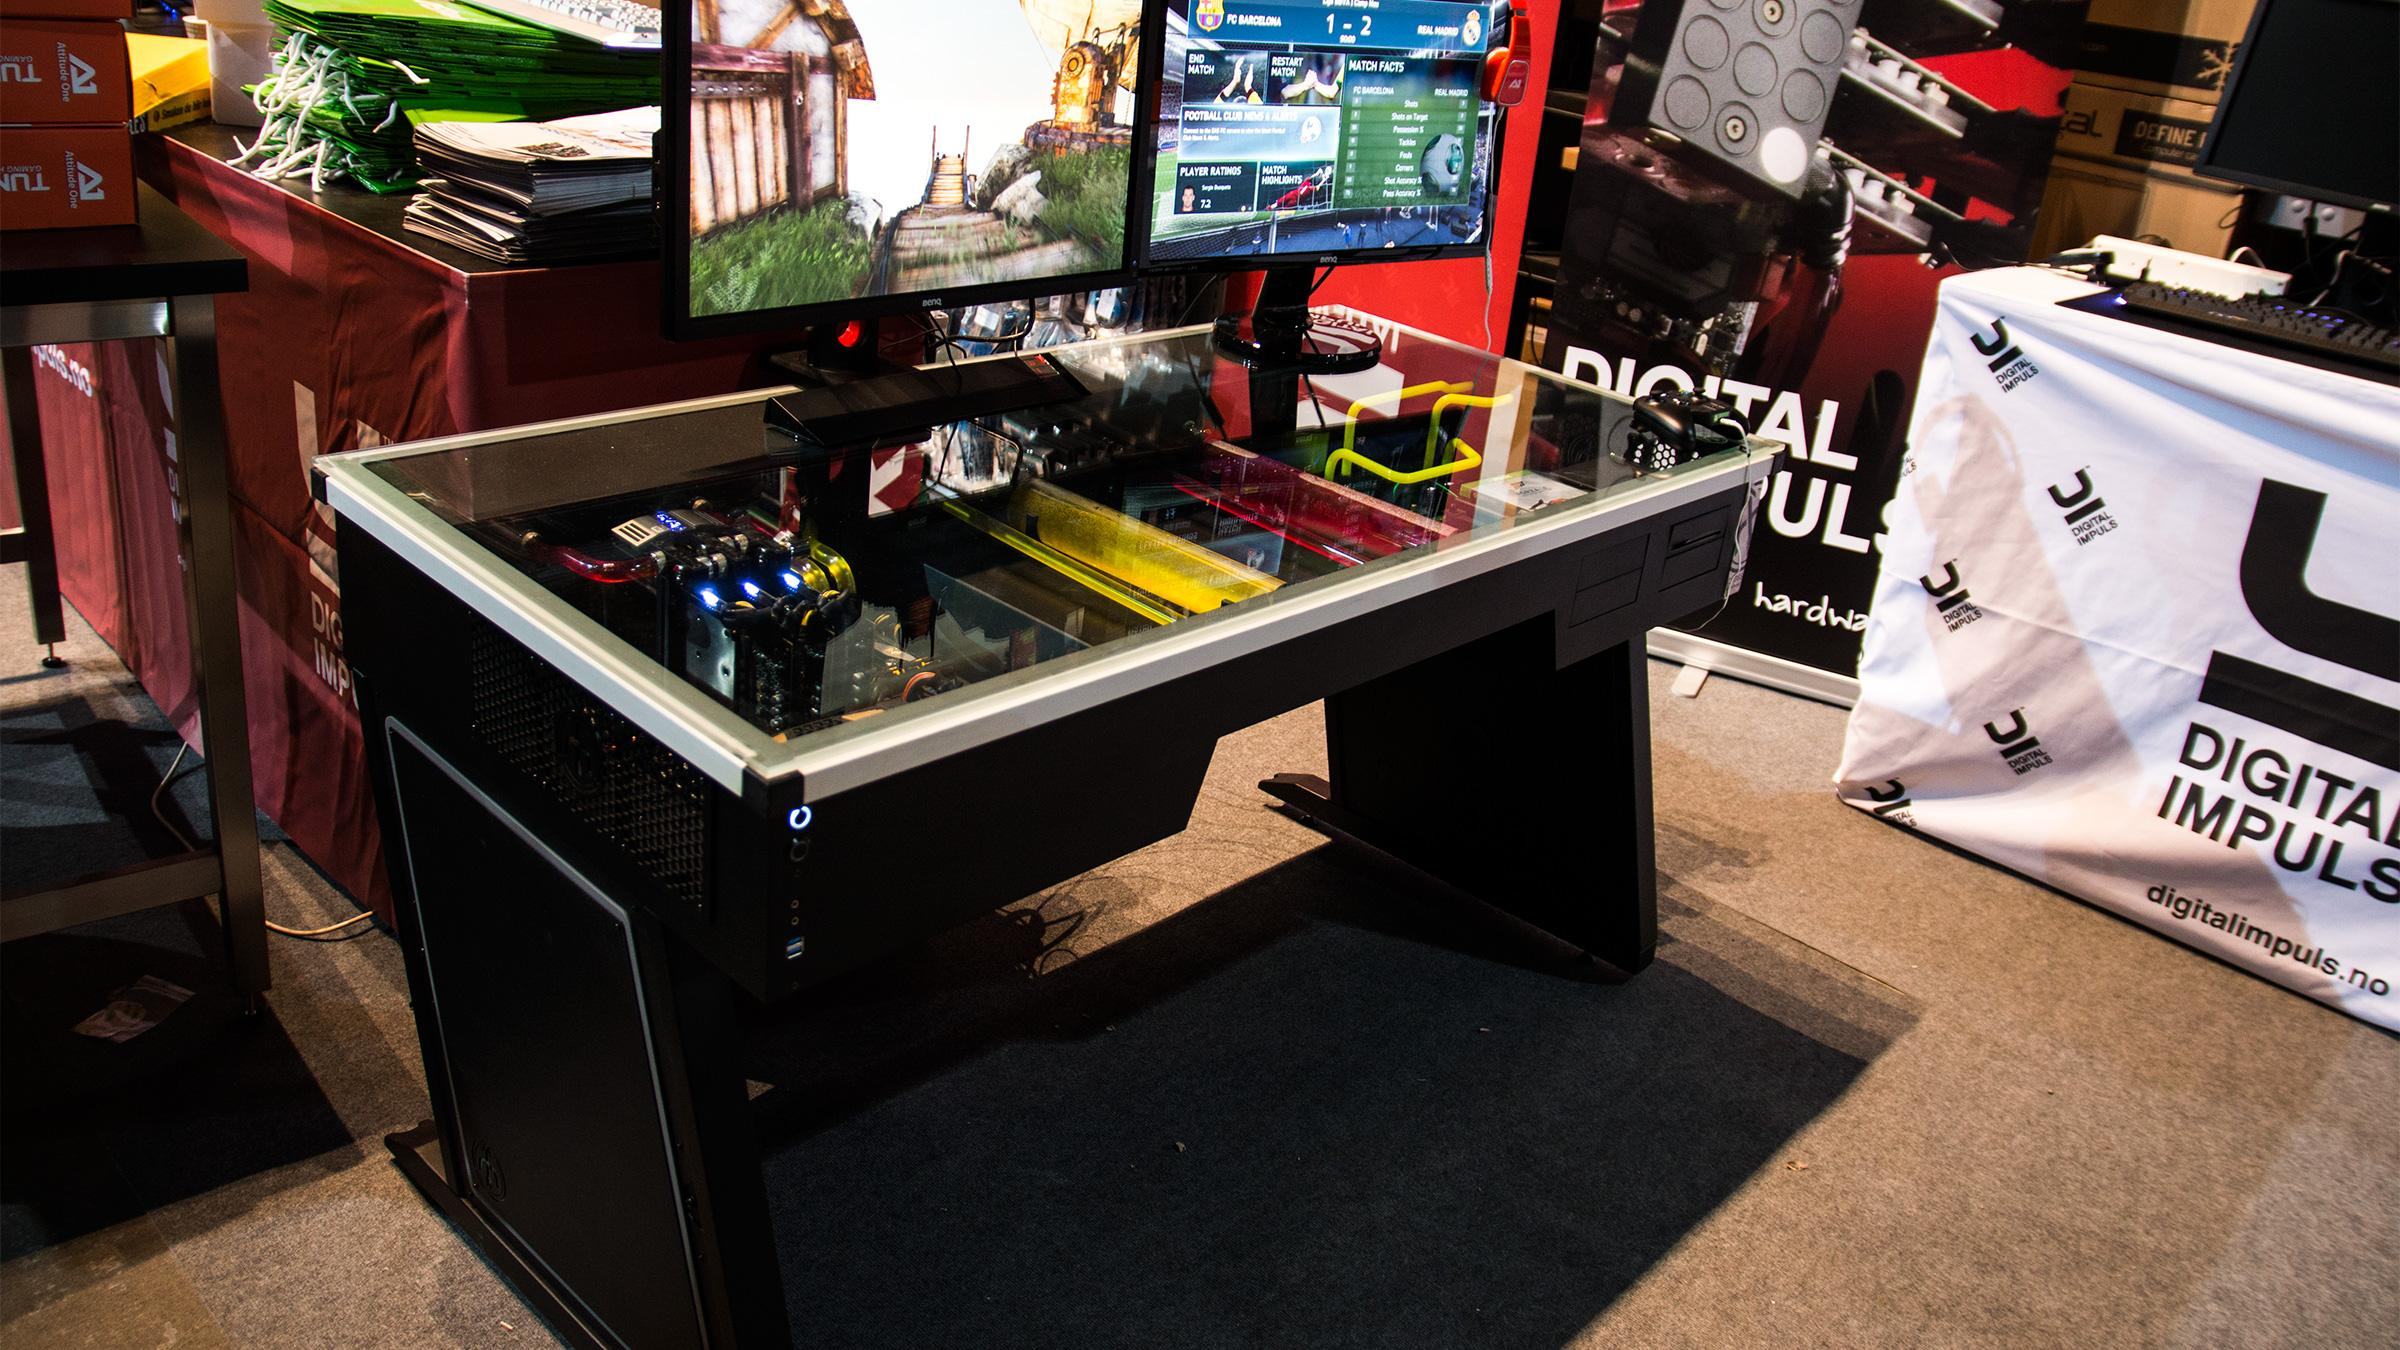 Digital Impuls har også snekret sammen et rent uhyre av en datamaskin, som de viser frem på sin stand.Foto: Varg Aamo, Hardware.no